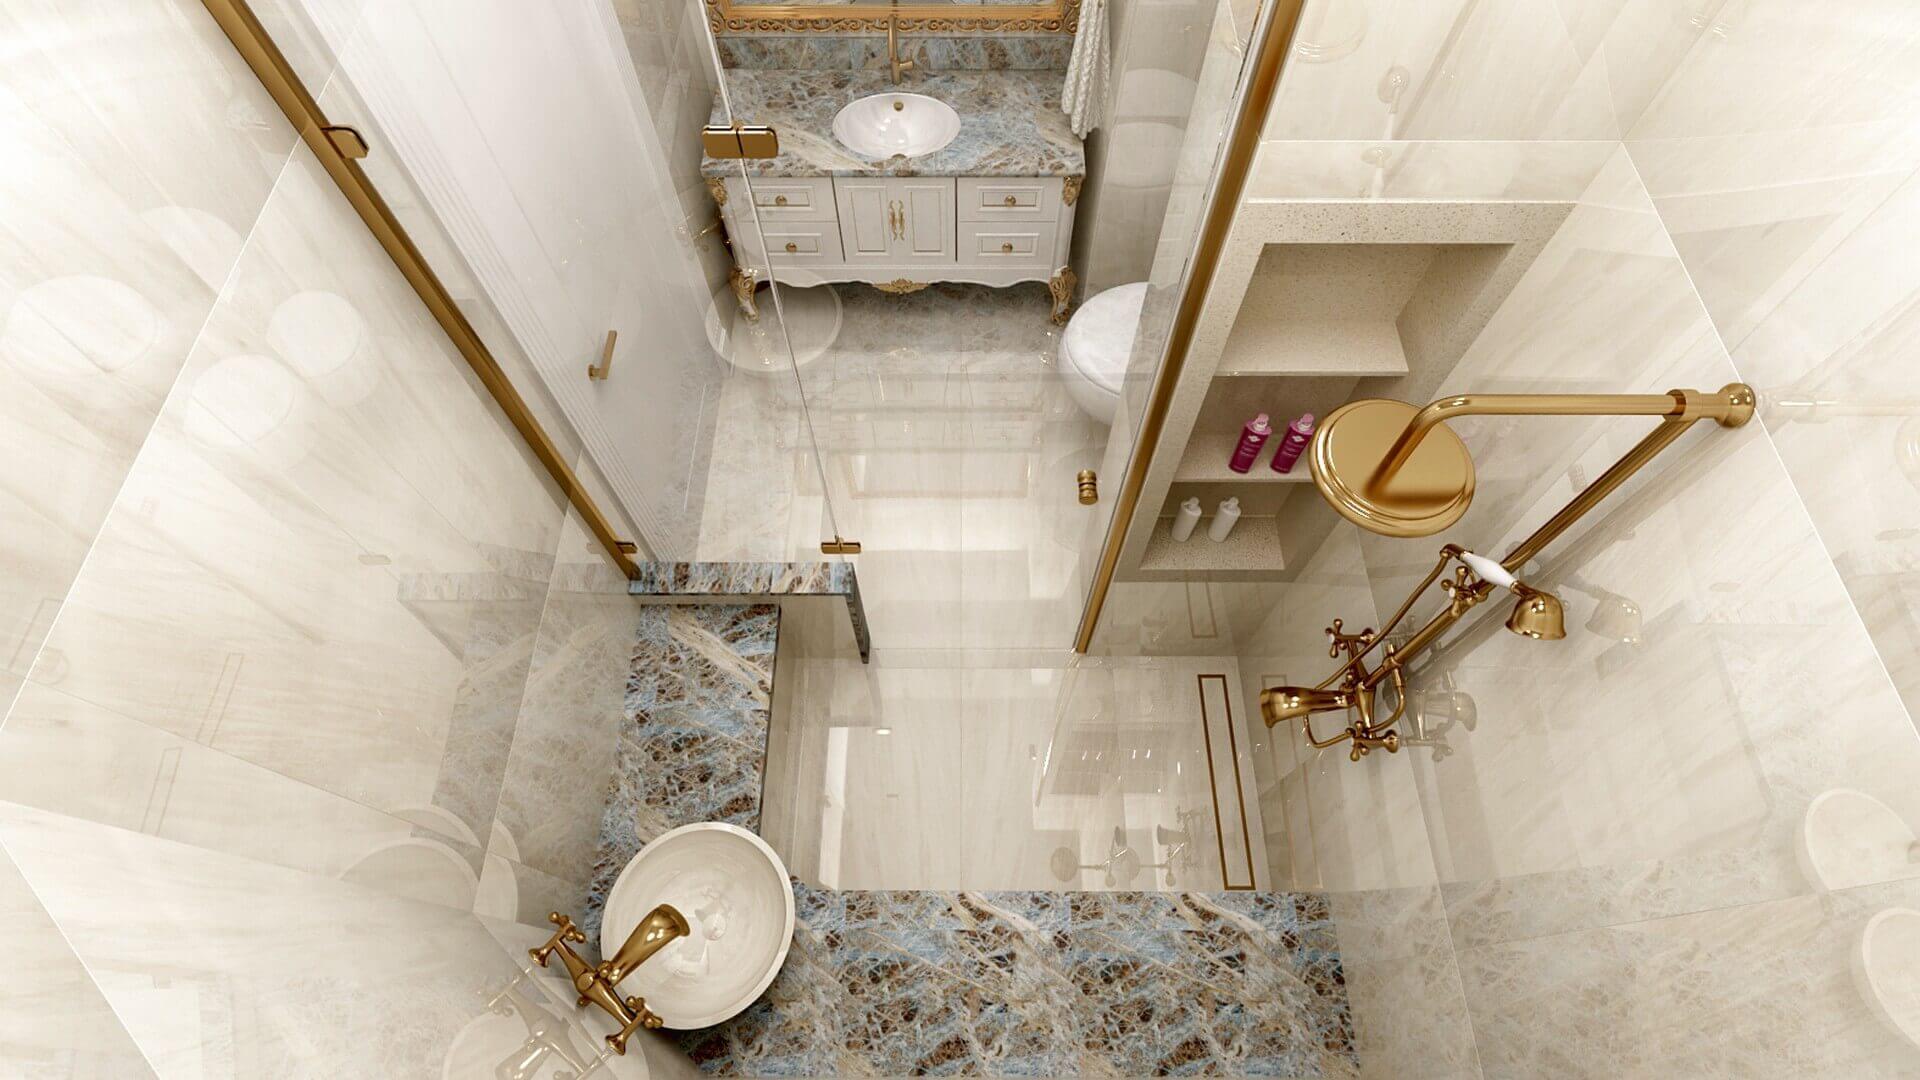 Ankara house decoration 3301 S. Aslan Flat Residential